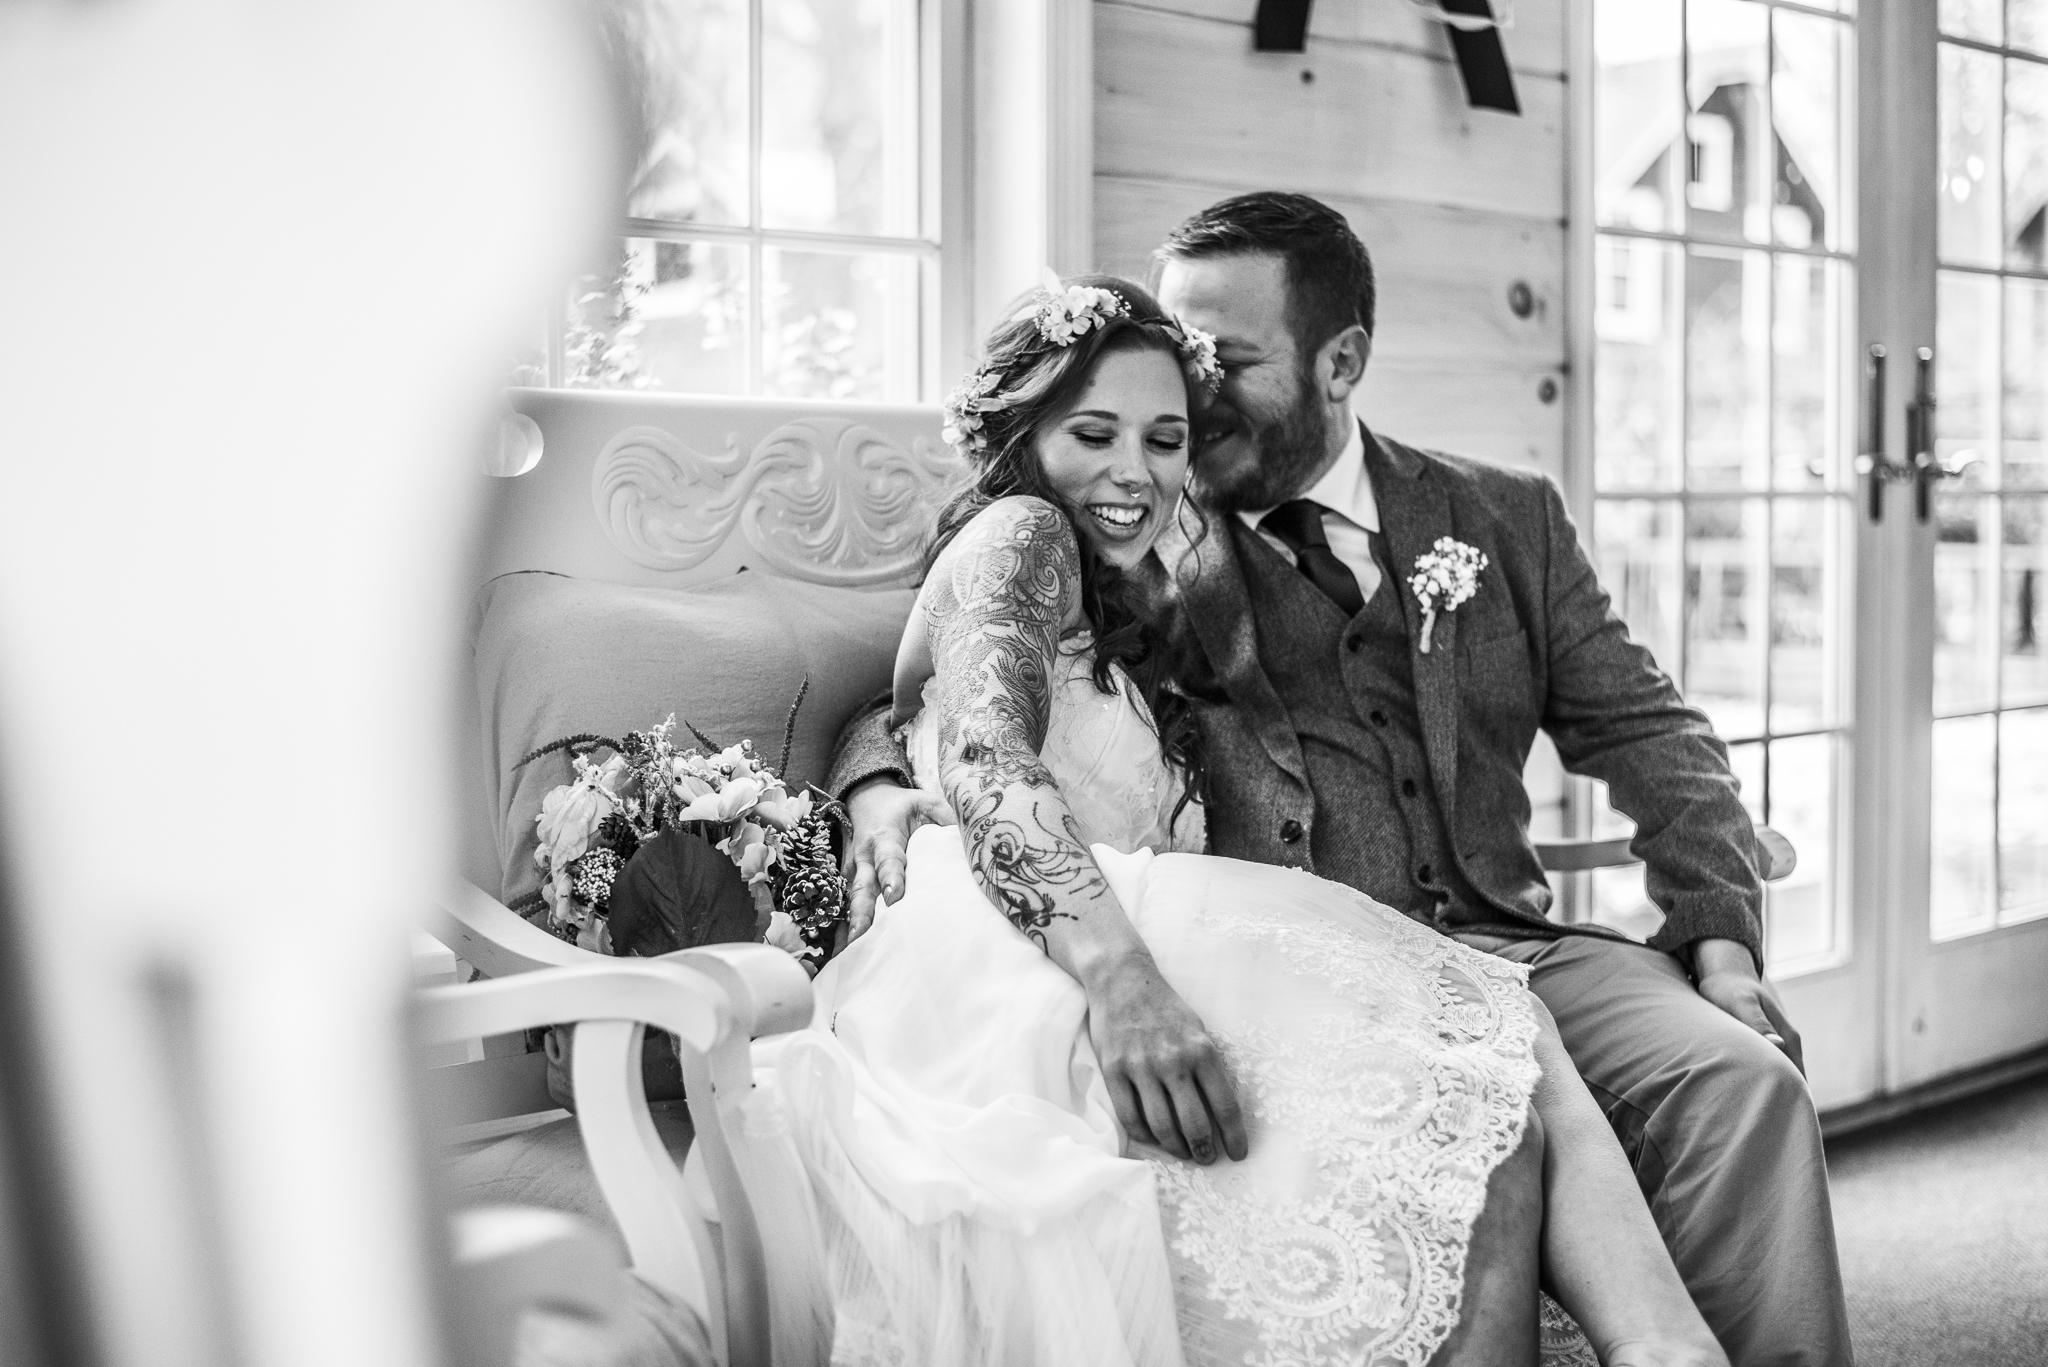 KateBrandon-Wedding-Portraits-Online-16.jpg